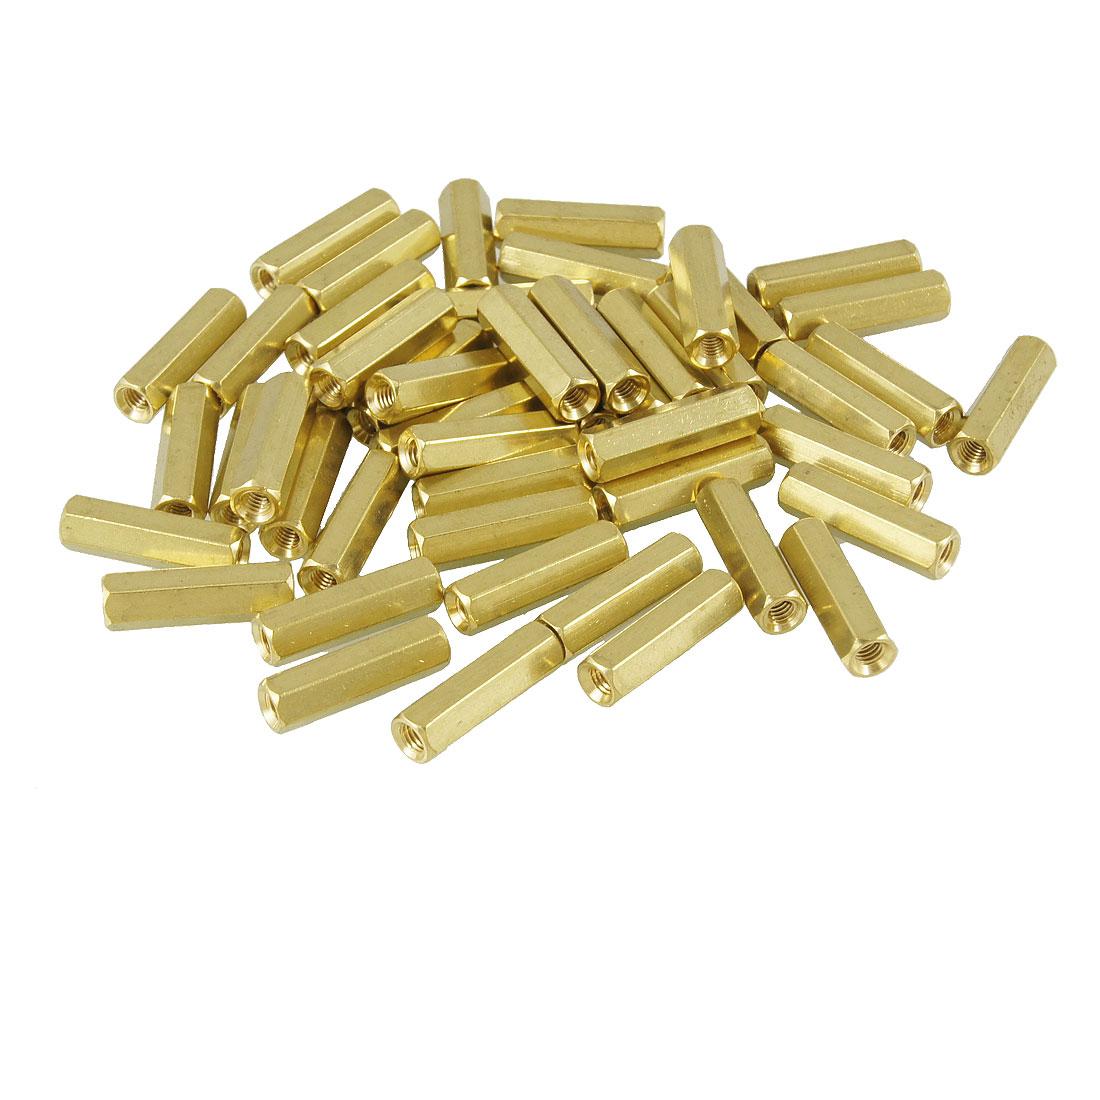 50 Pcs M3X14mm Gold Tone Female Thread PCB Standoff Spacers